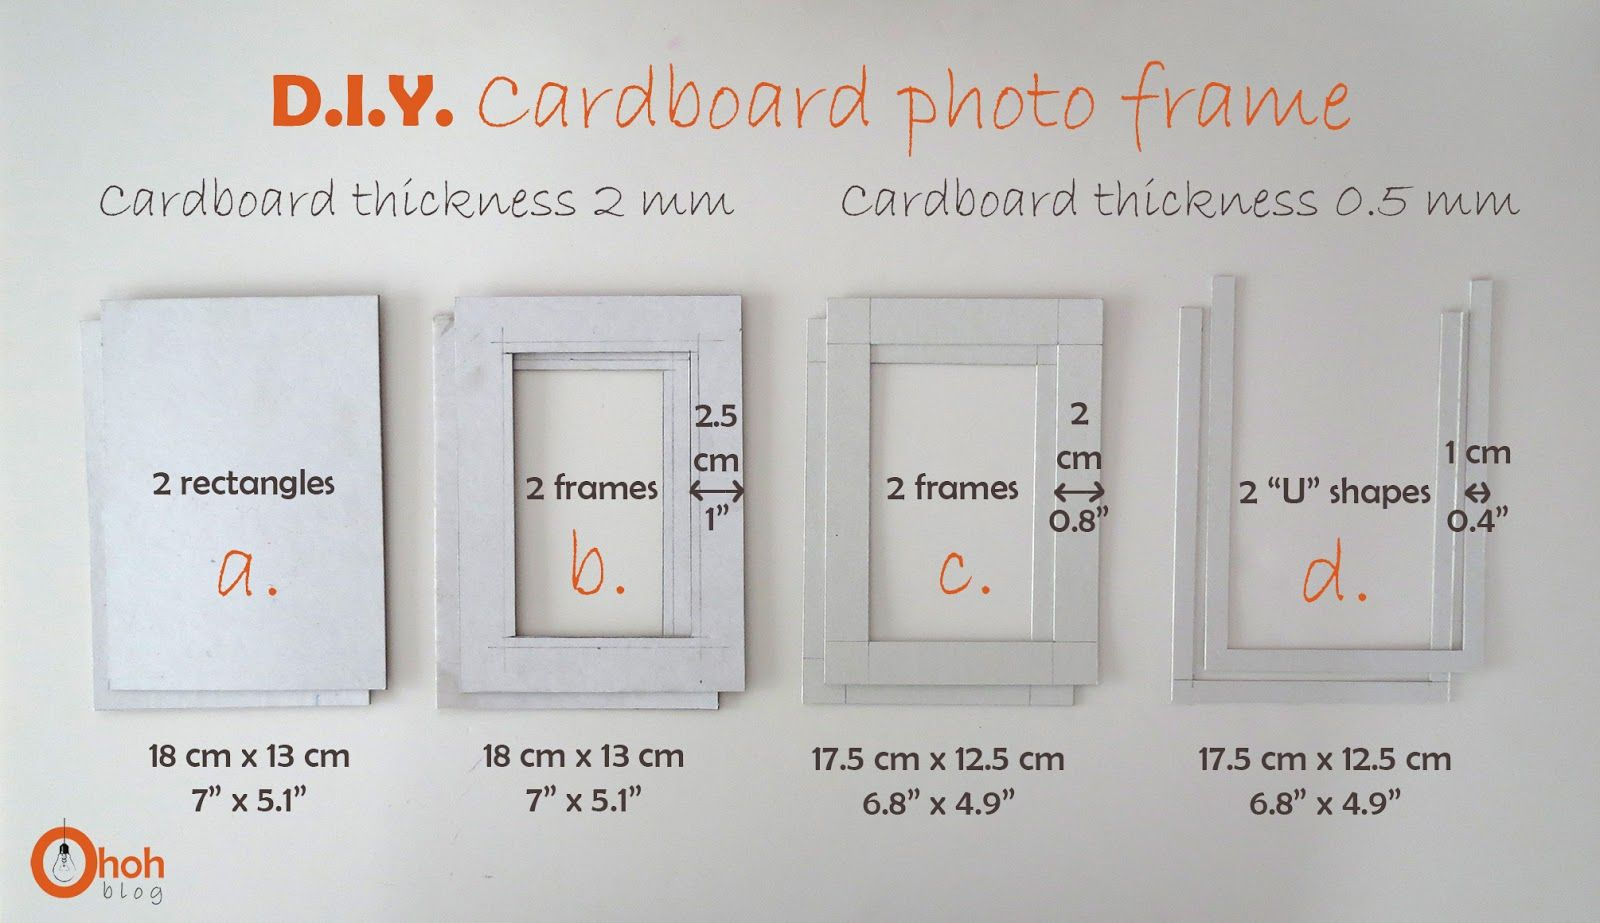 DIY Cardboard photo frame | Diy cardboard, Craft and Cardboard ...